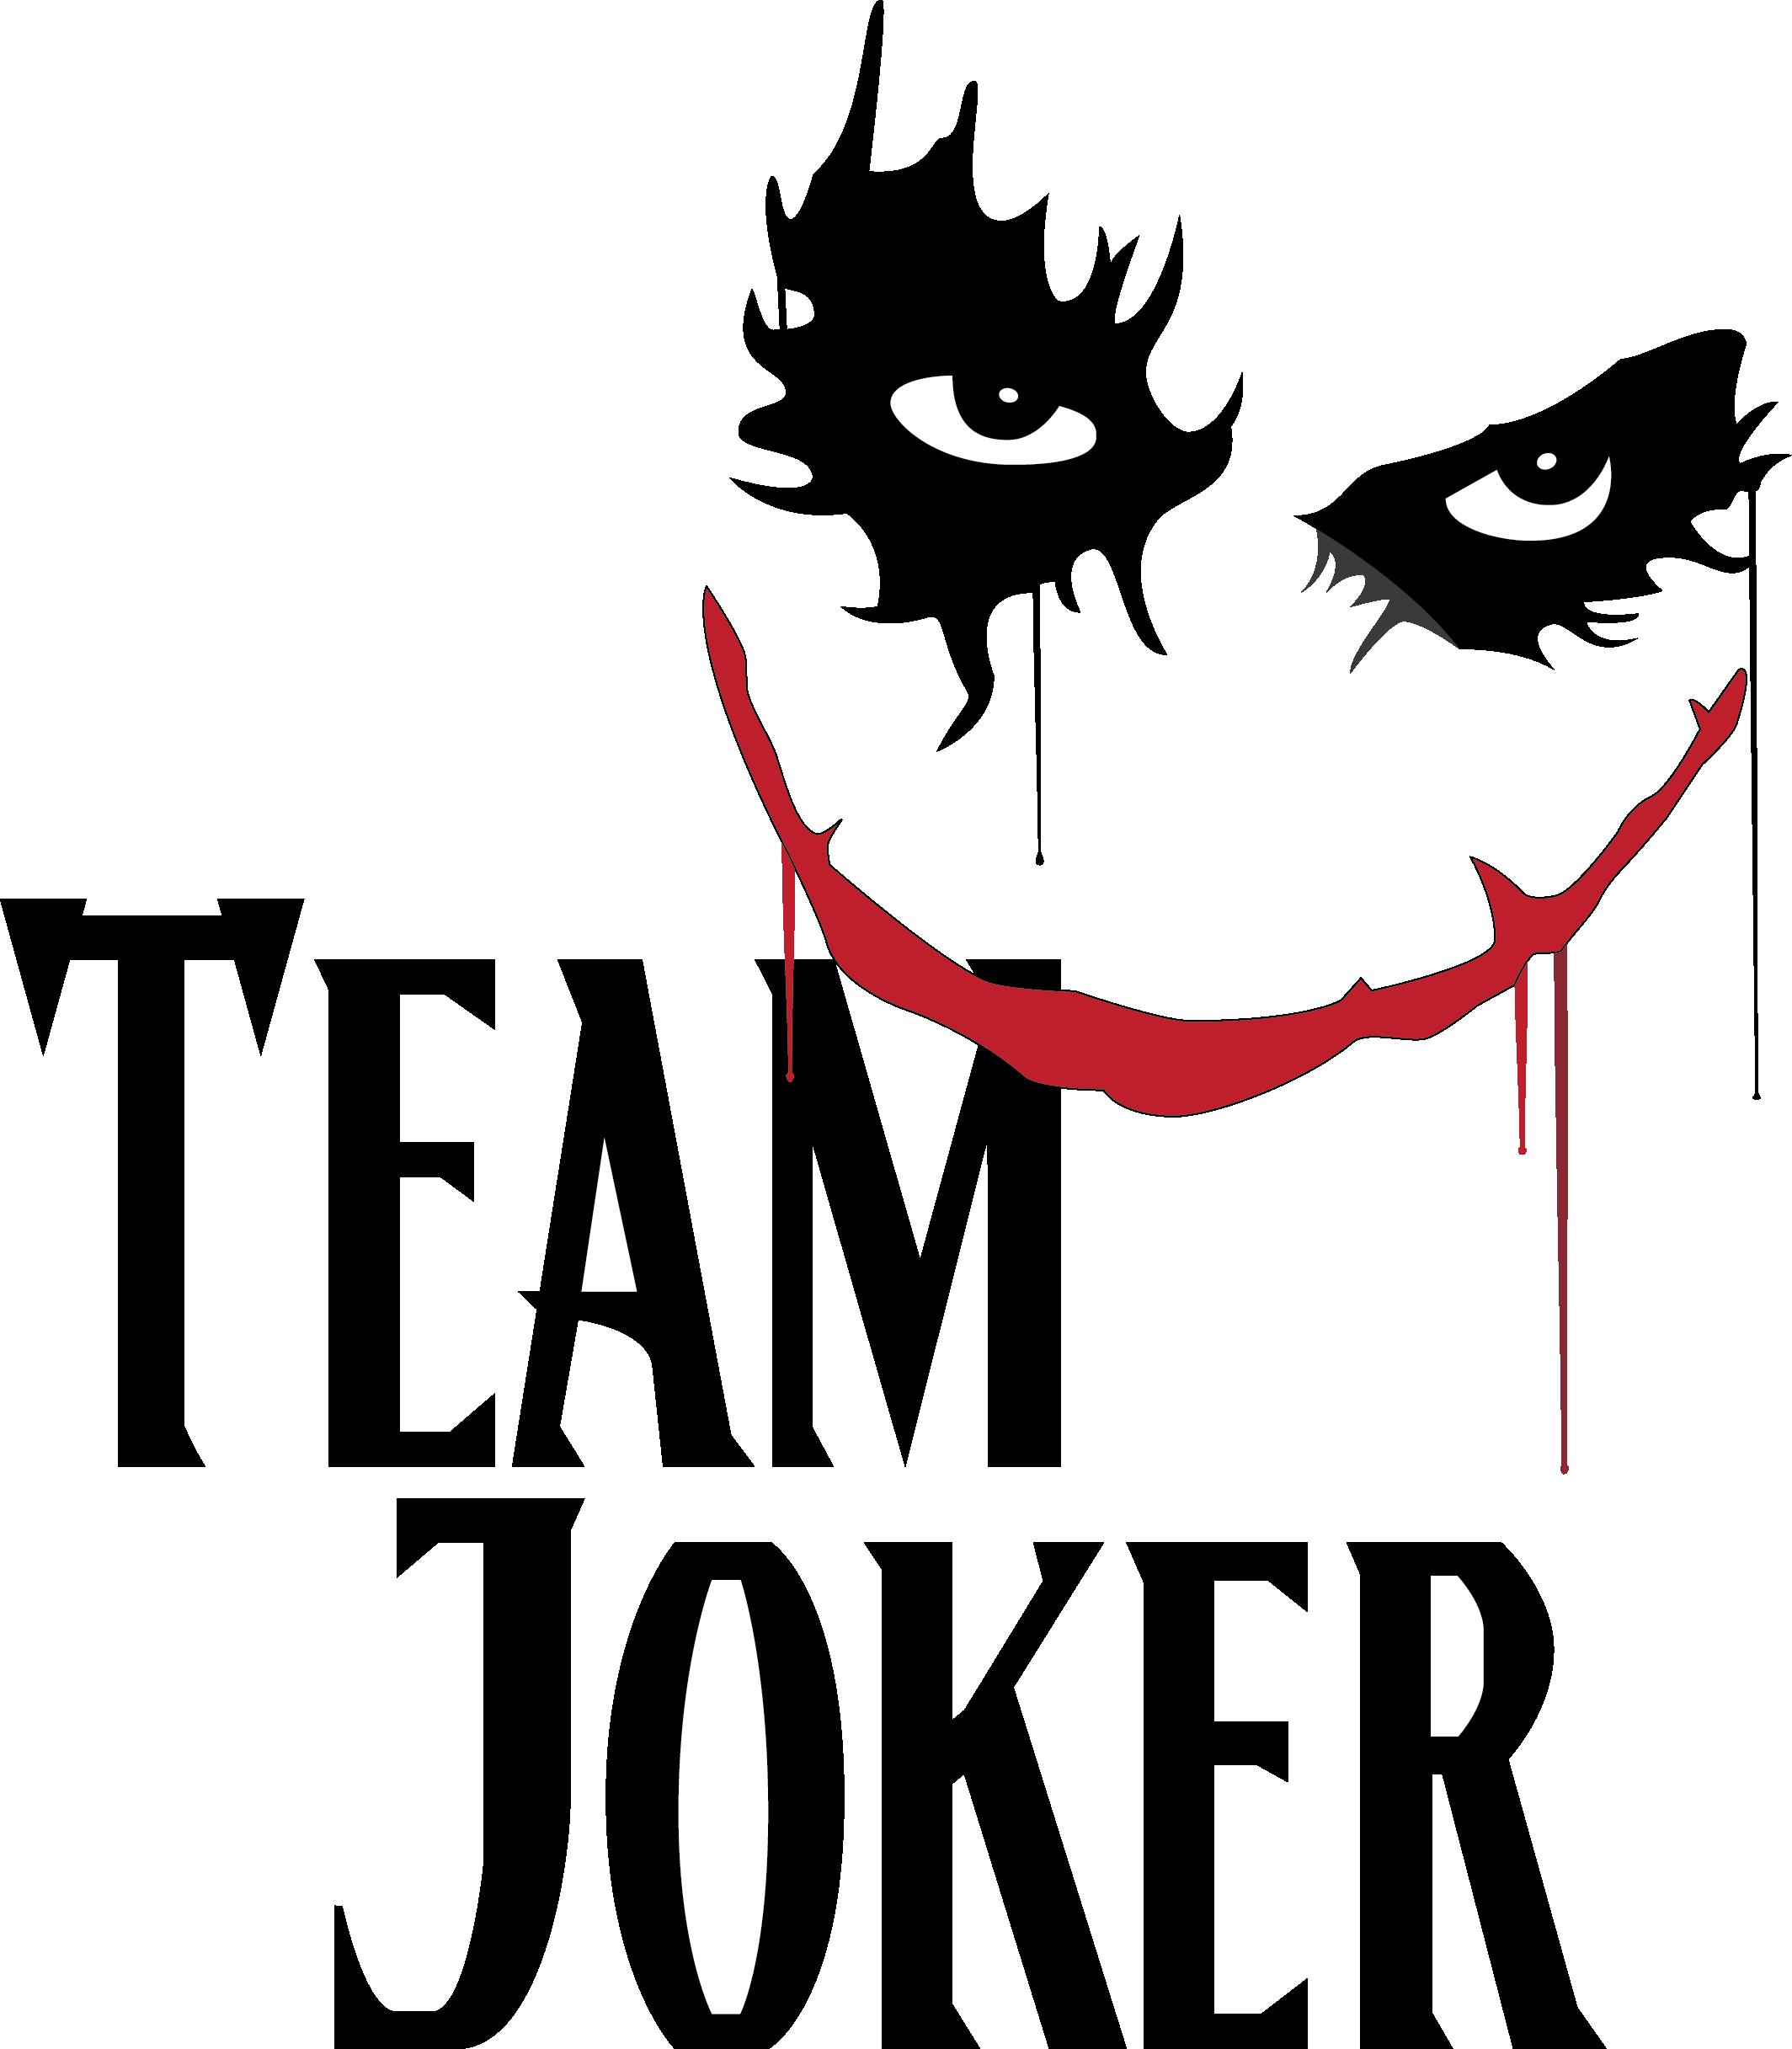 Cool joker logo by miss ivey hintz